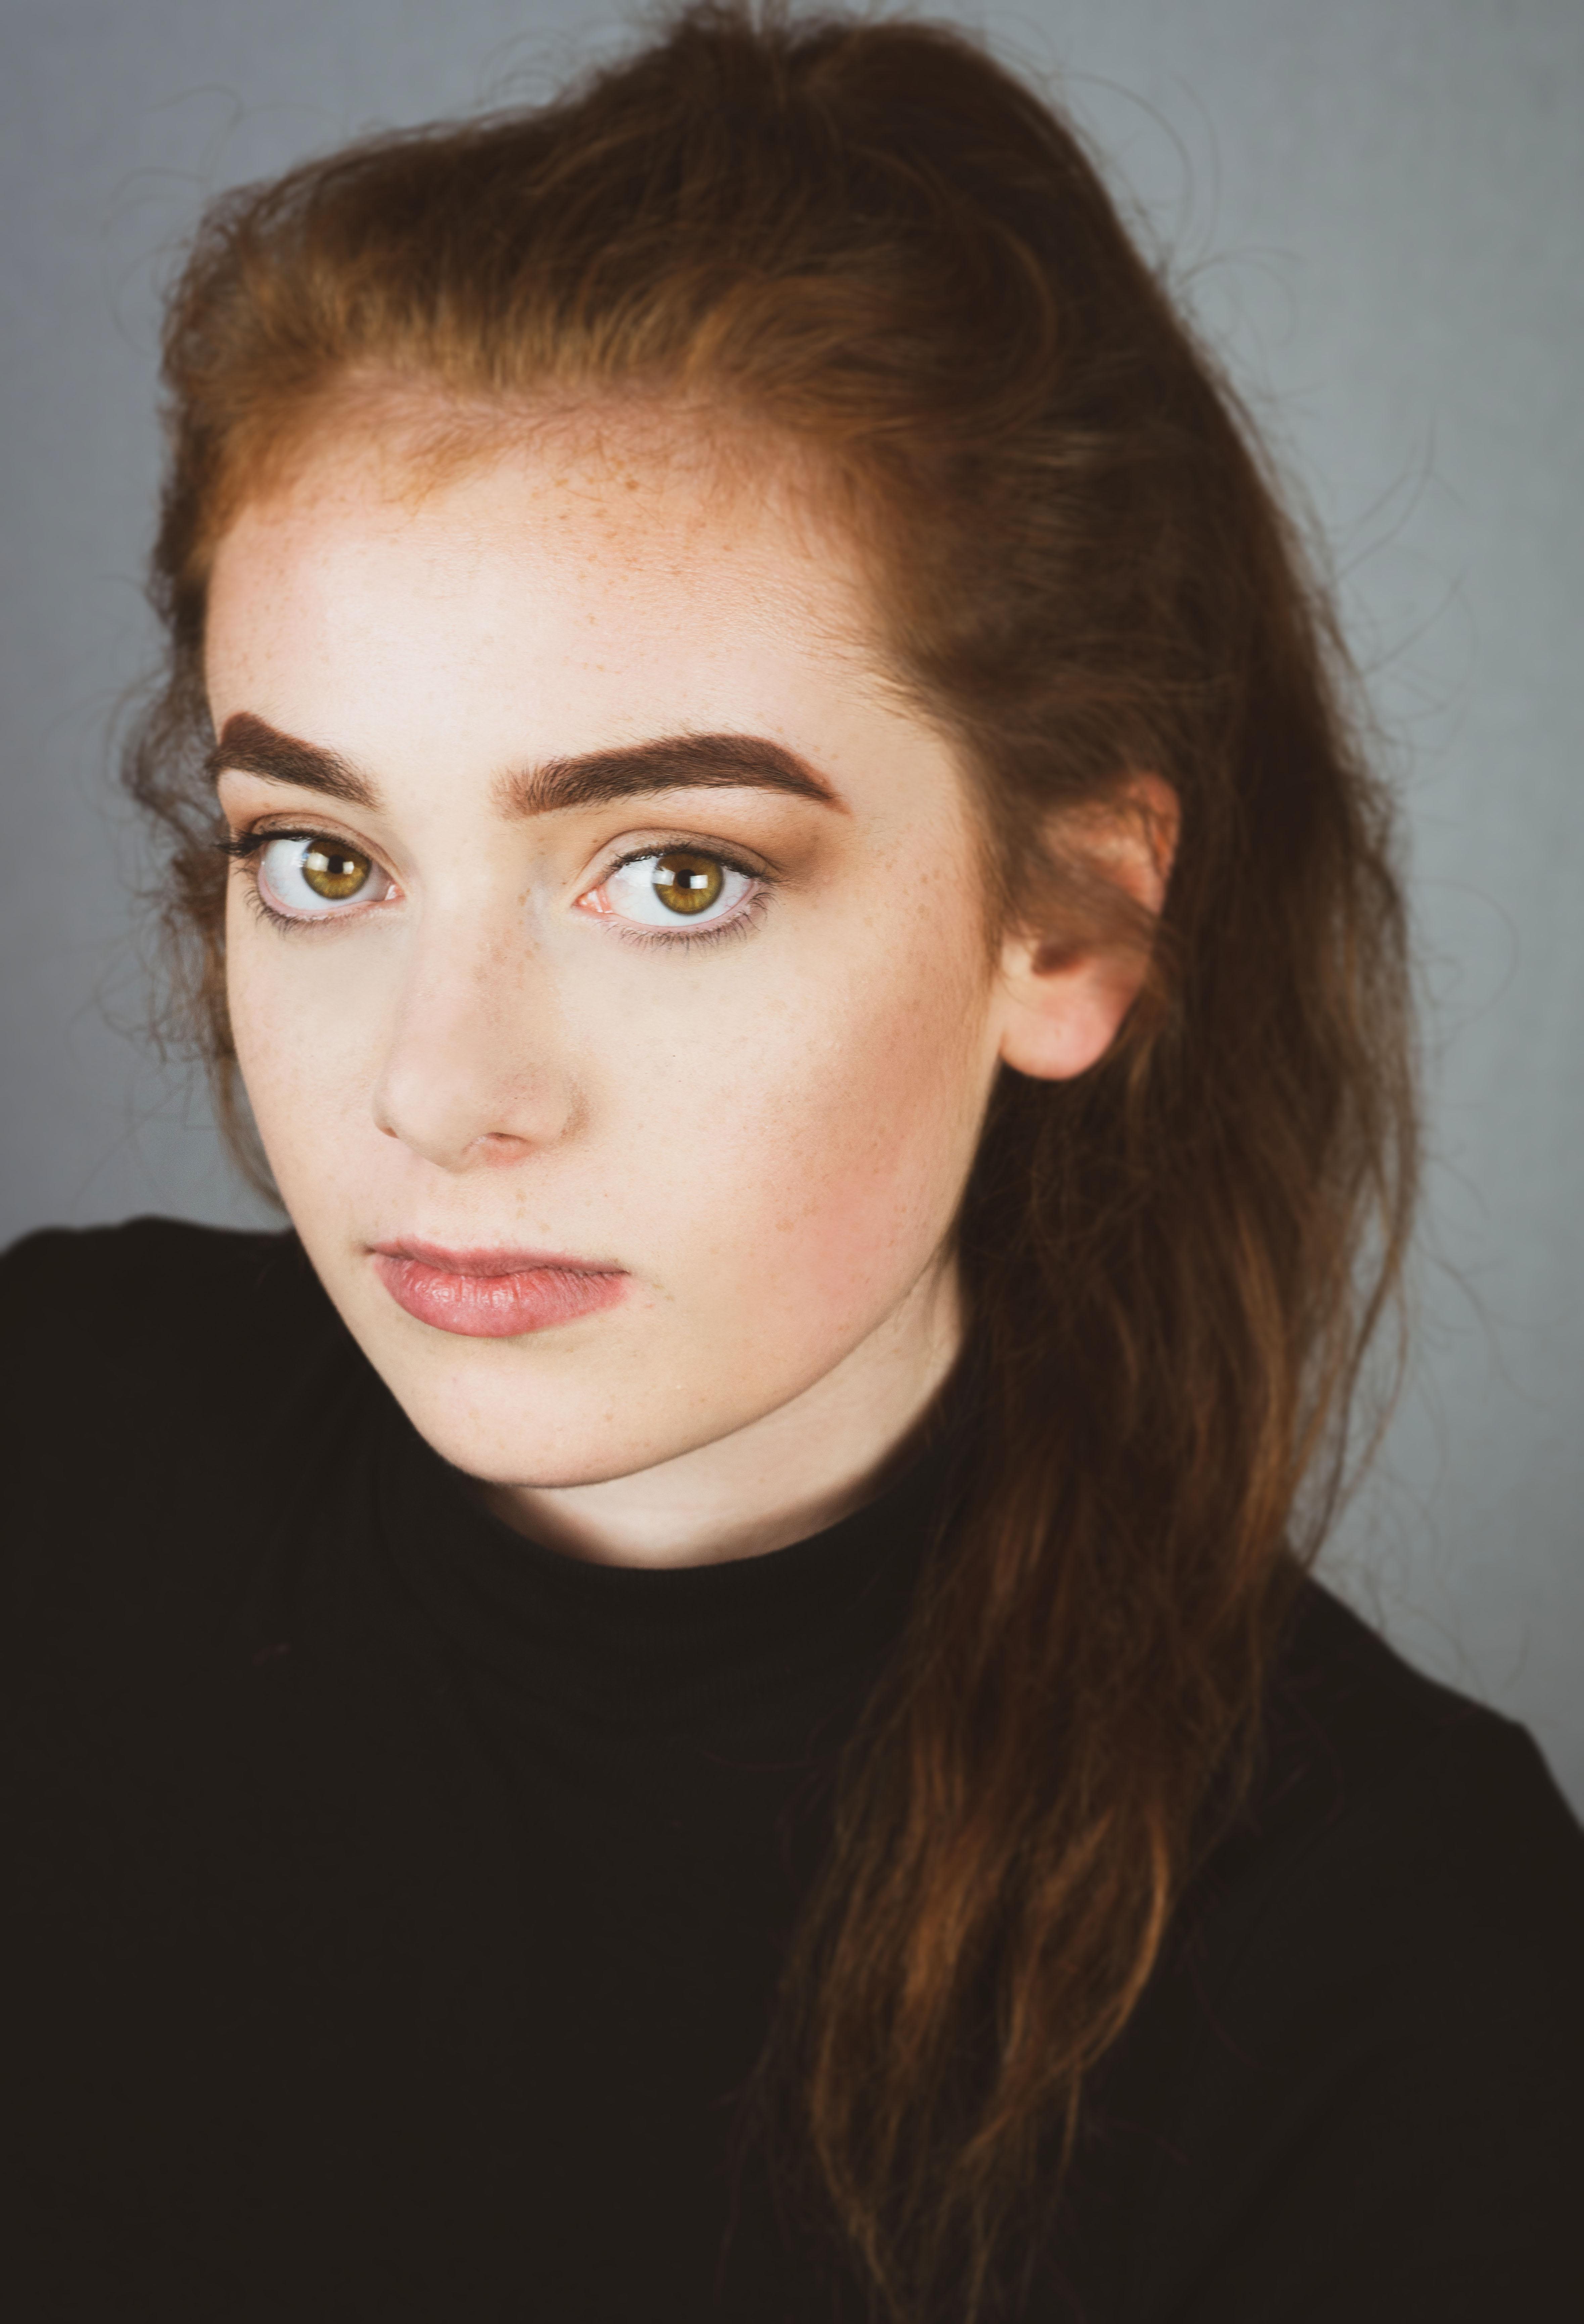 Bethany Forrester